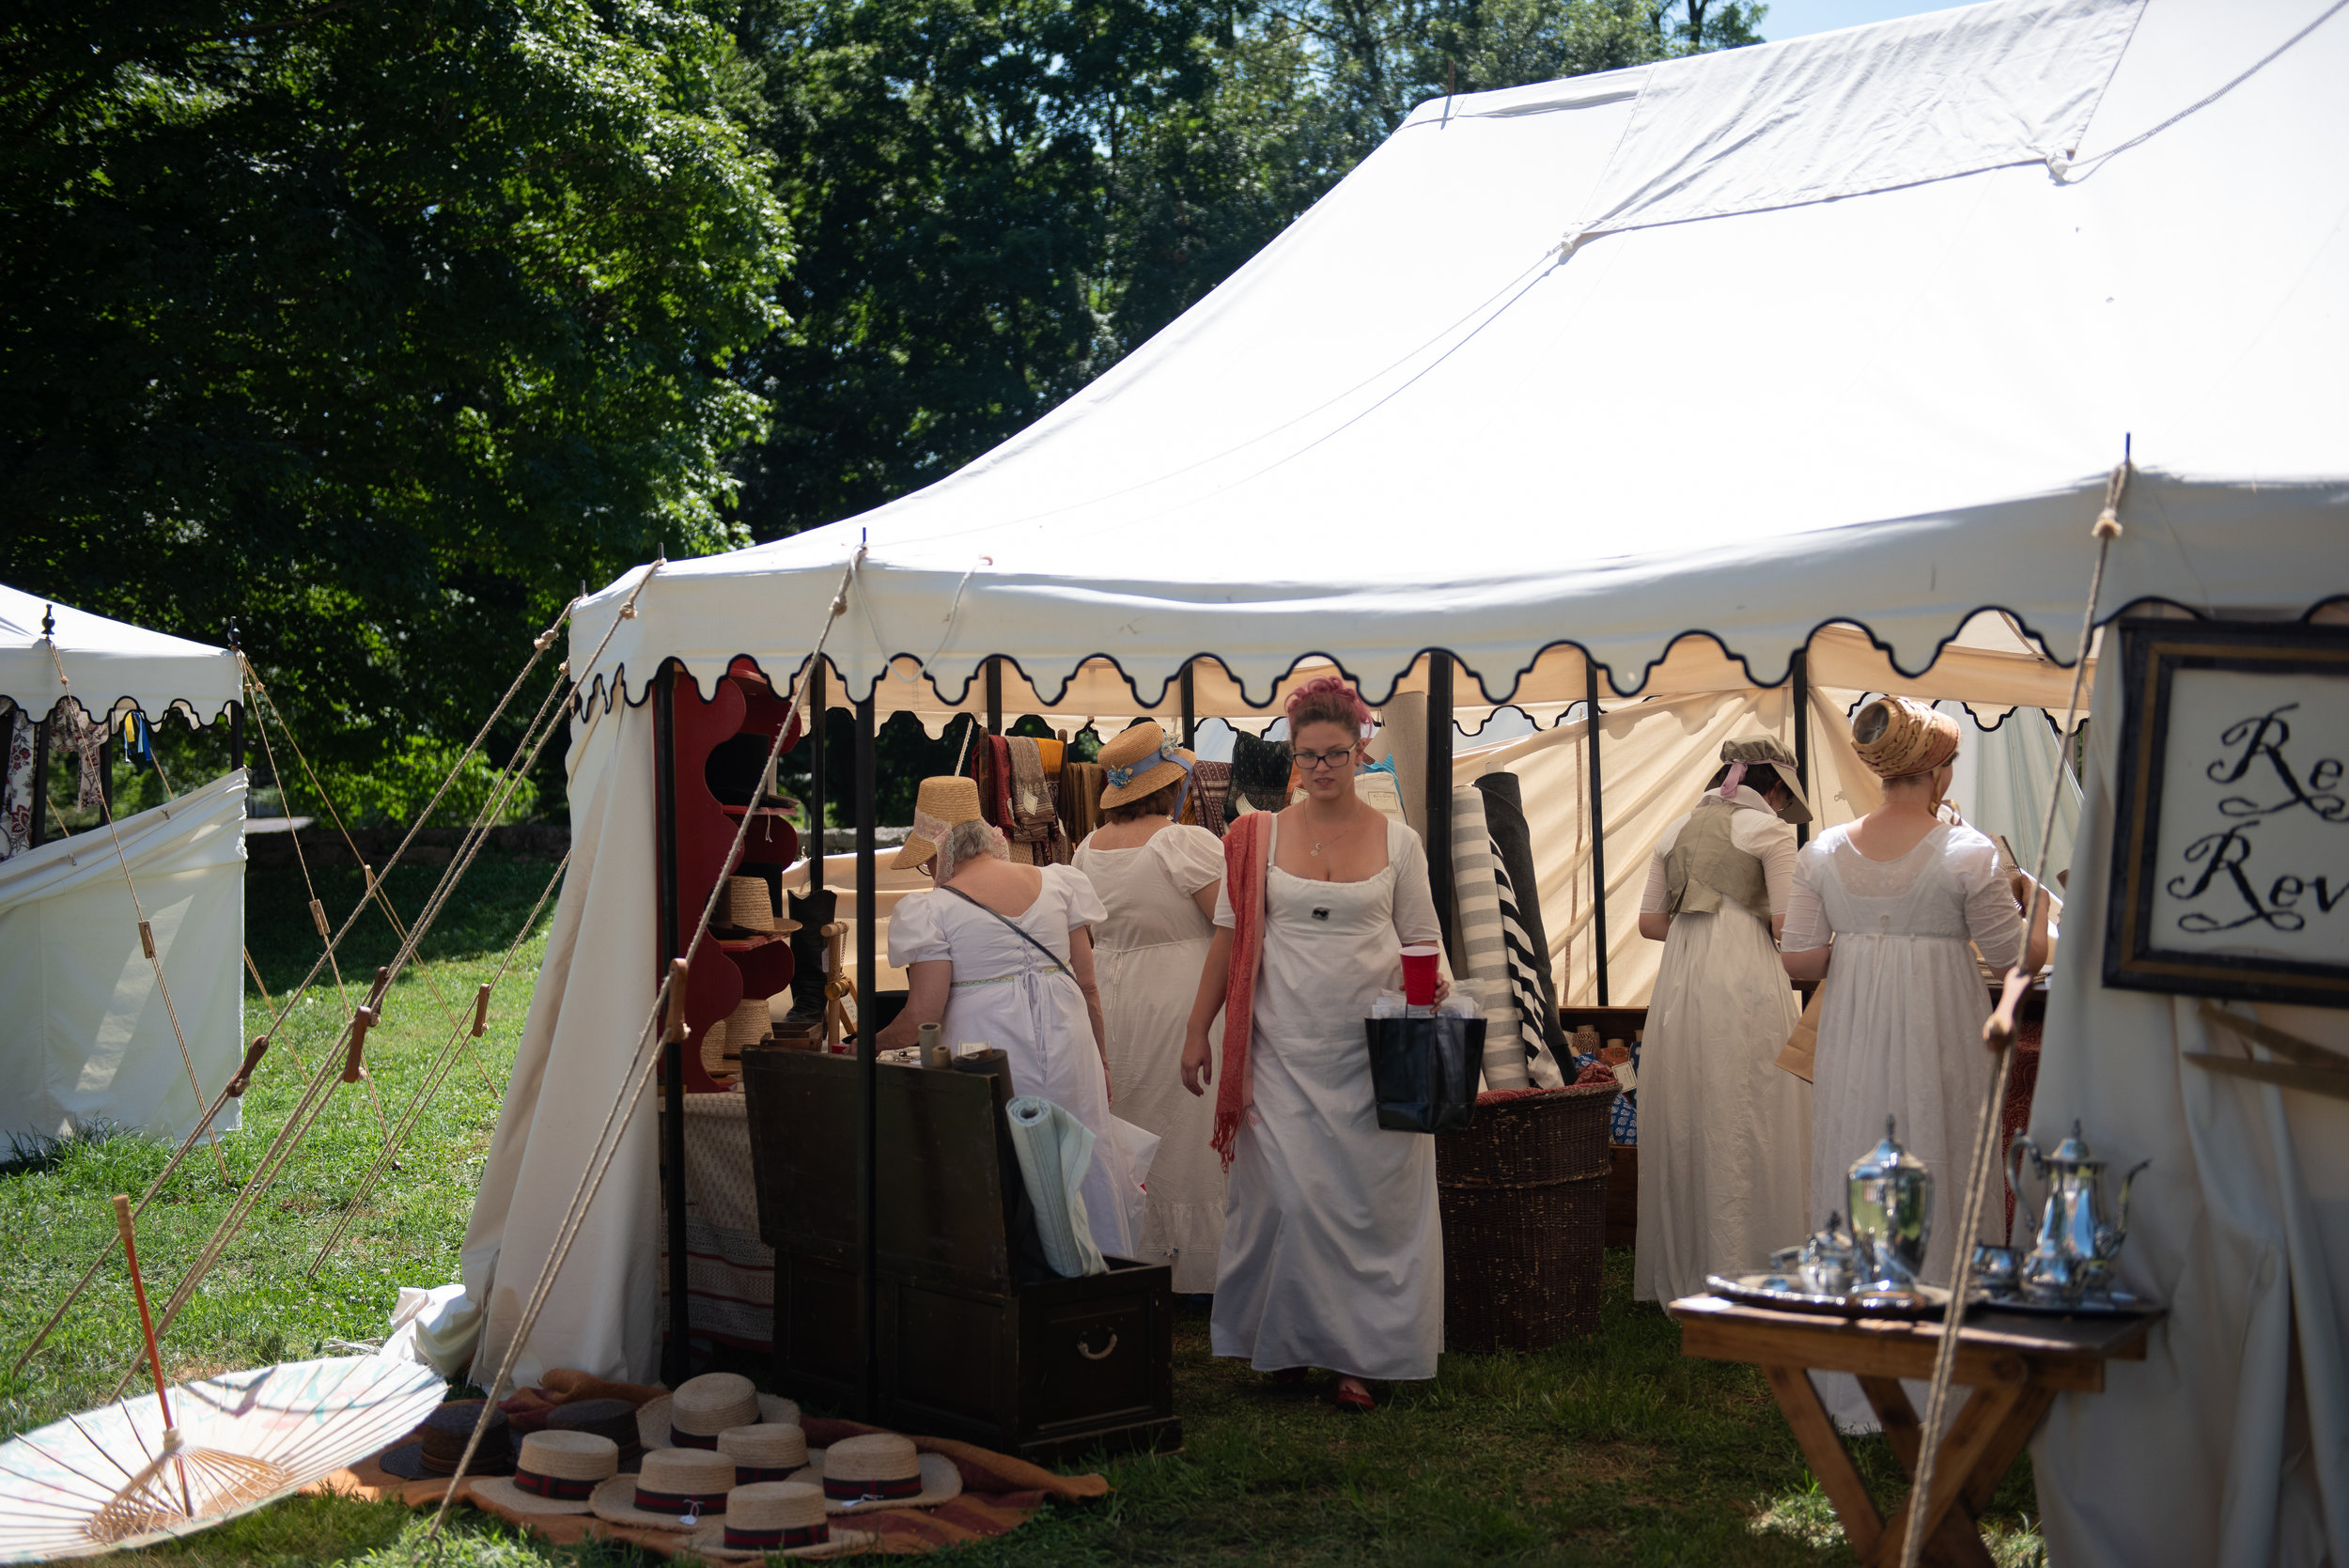 Jane Austen Festival Louisville Kentucky 2019 Vendors